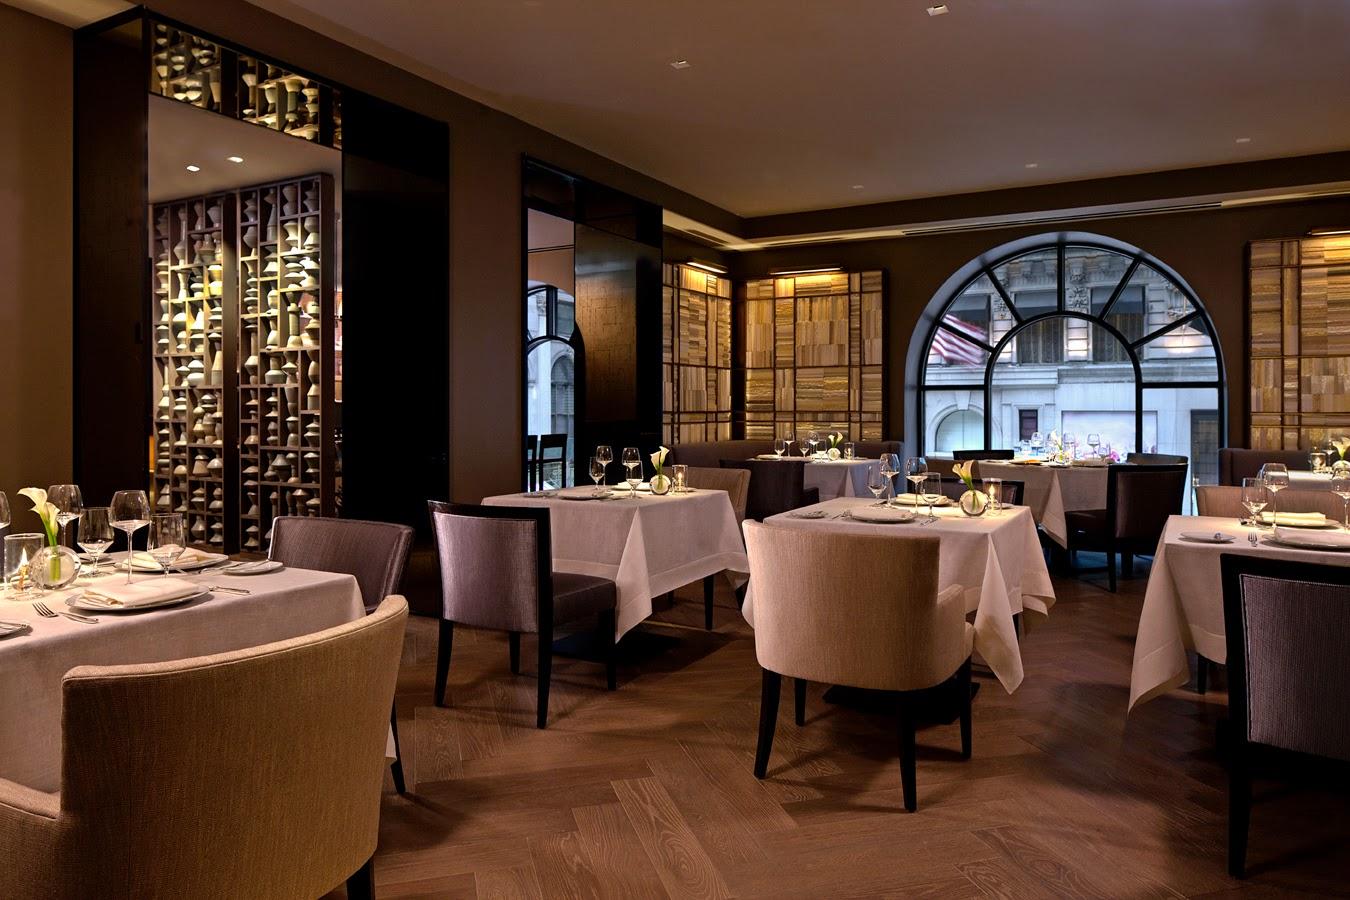 A la d couverte du restaurant clement au peninsula new york maryo 39 s bazaar - Hotel avec cuisine new york ...